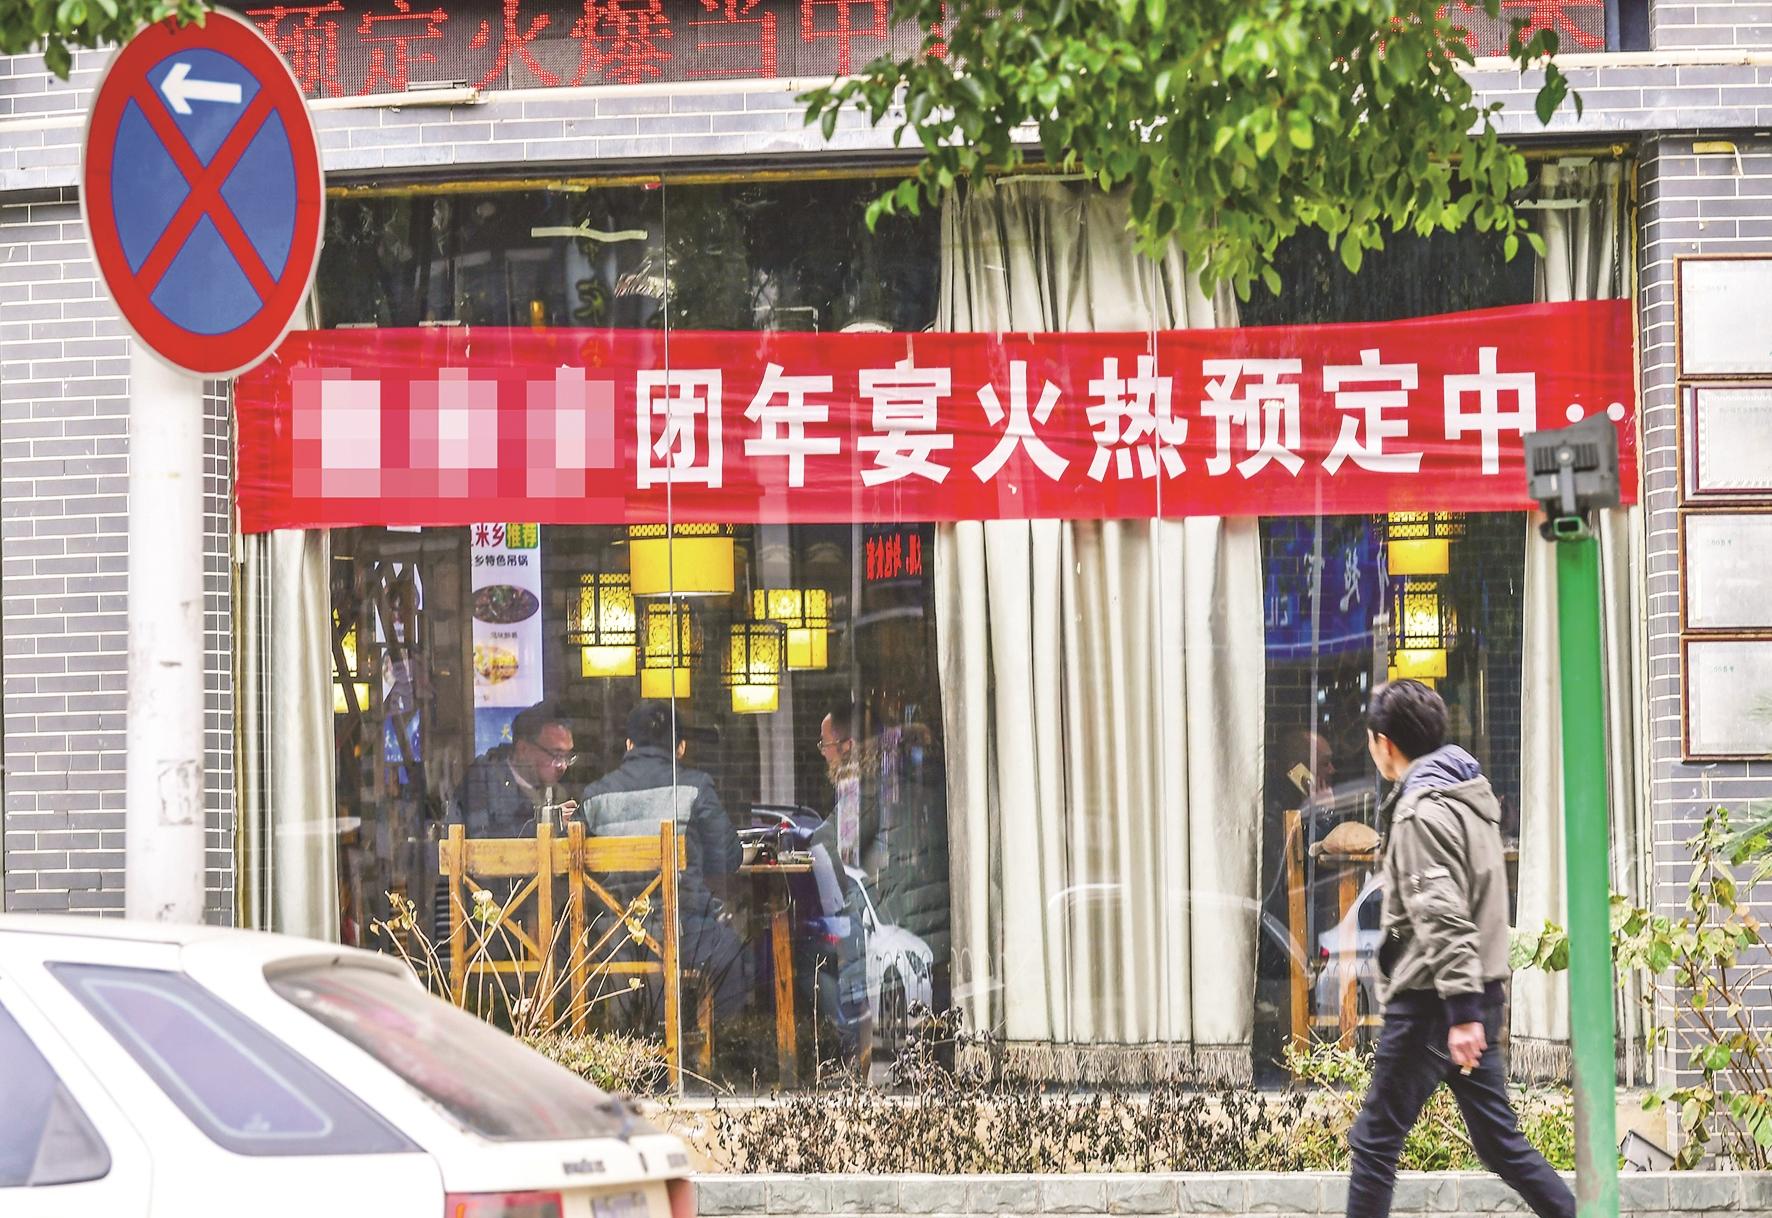 http://www.shangoudaohang.com/haitao/257991.html